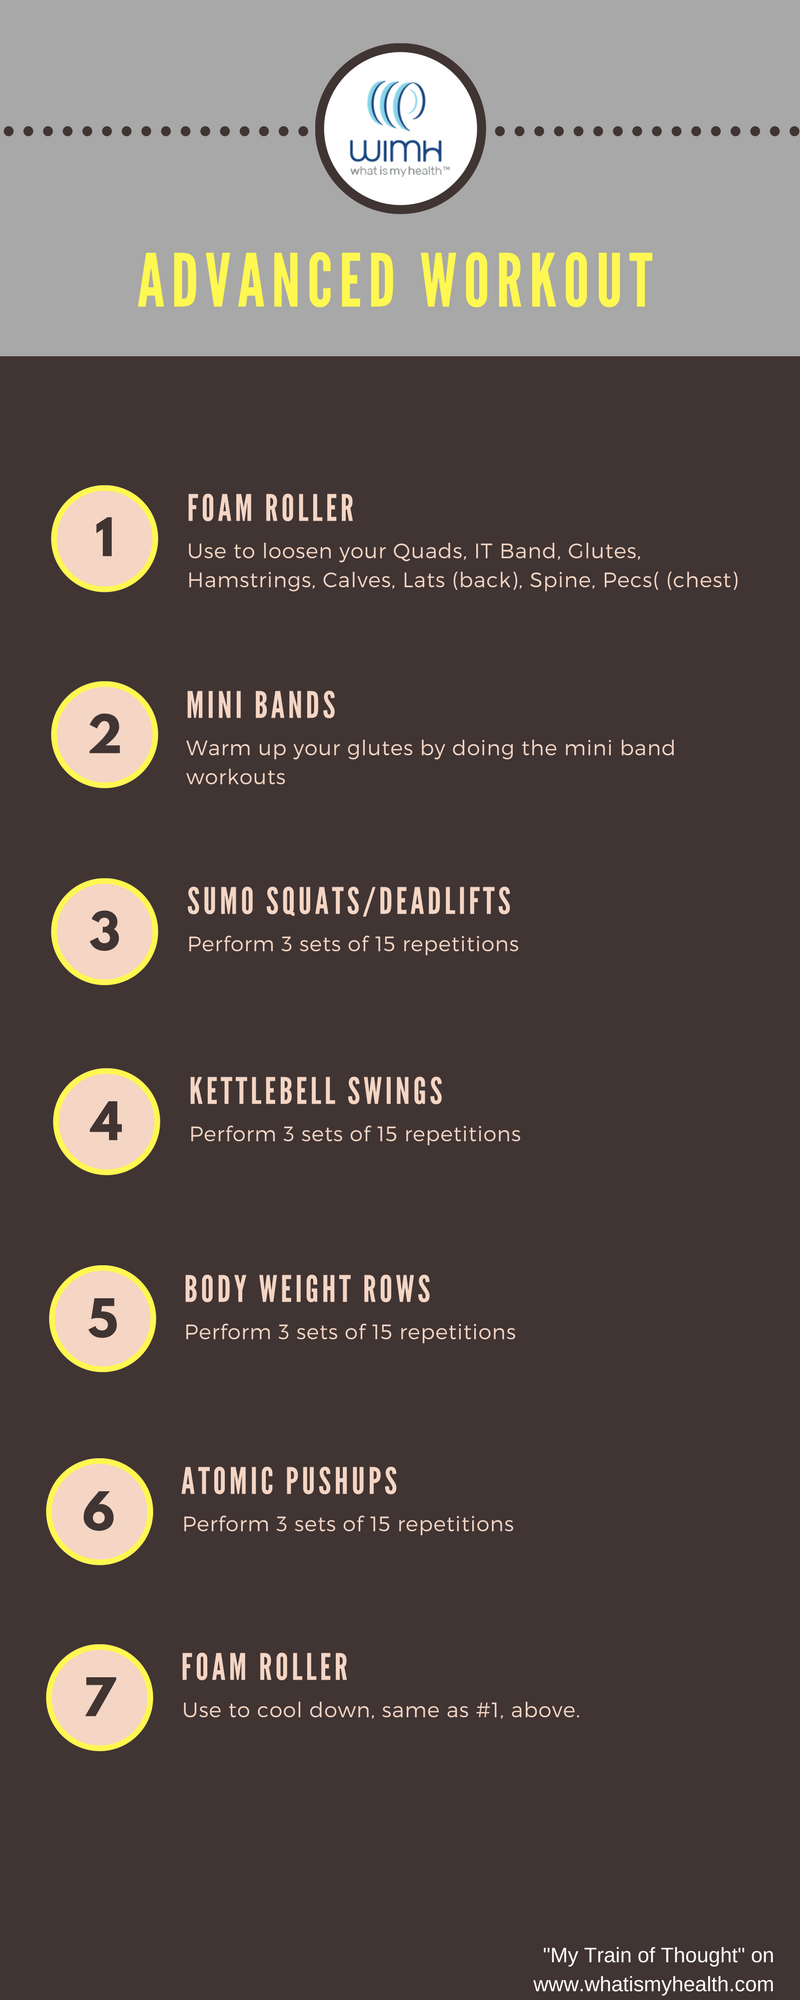 Home Gym Workout- Advanced